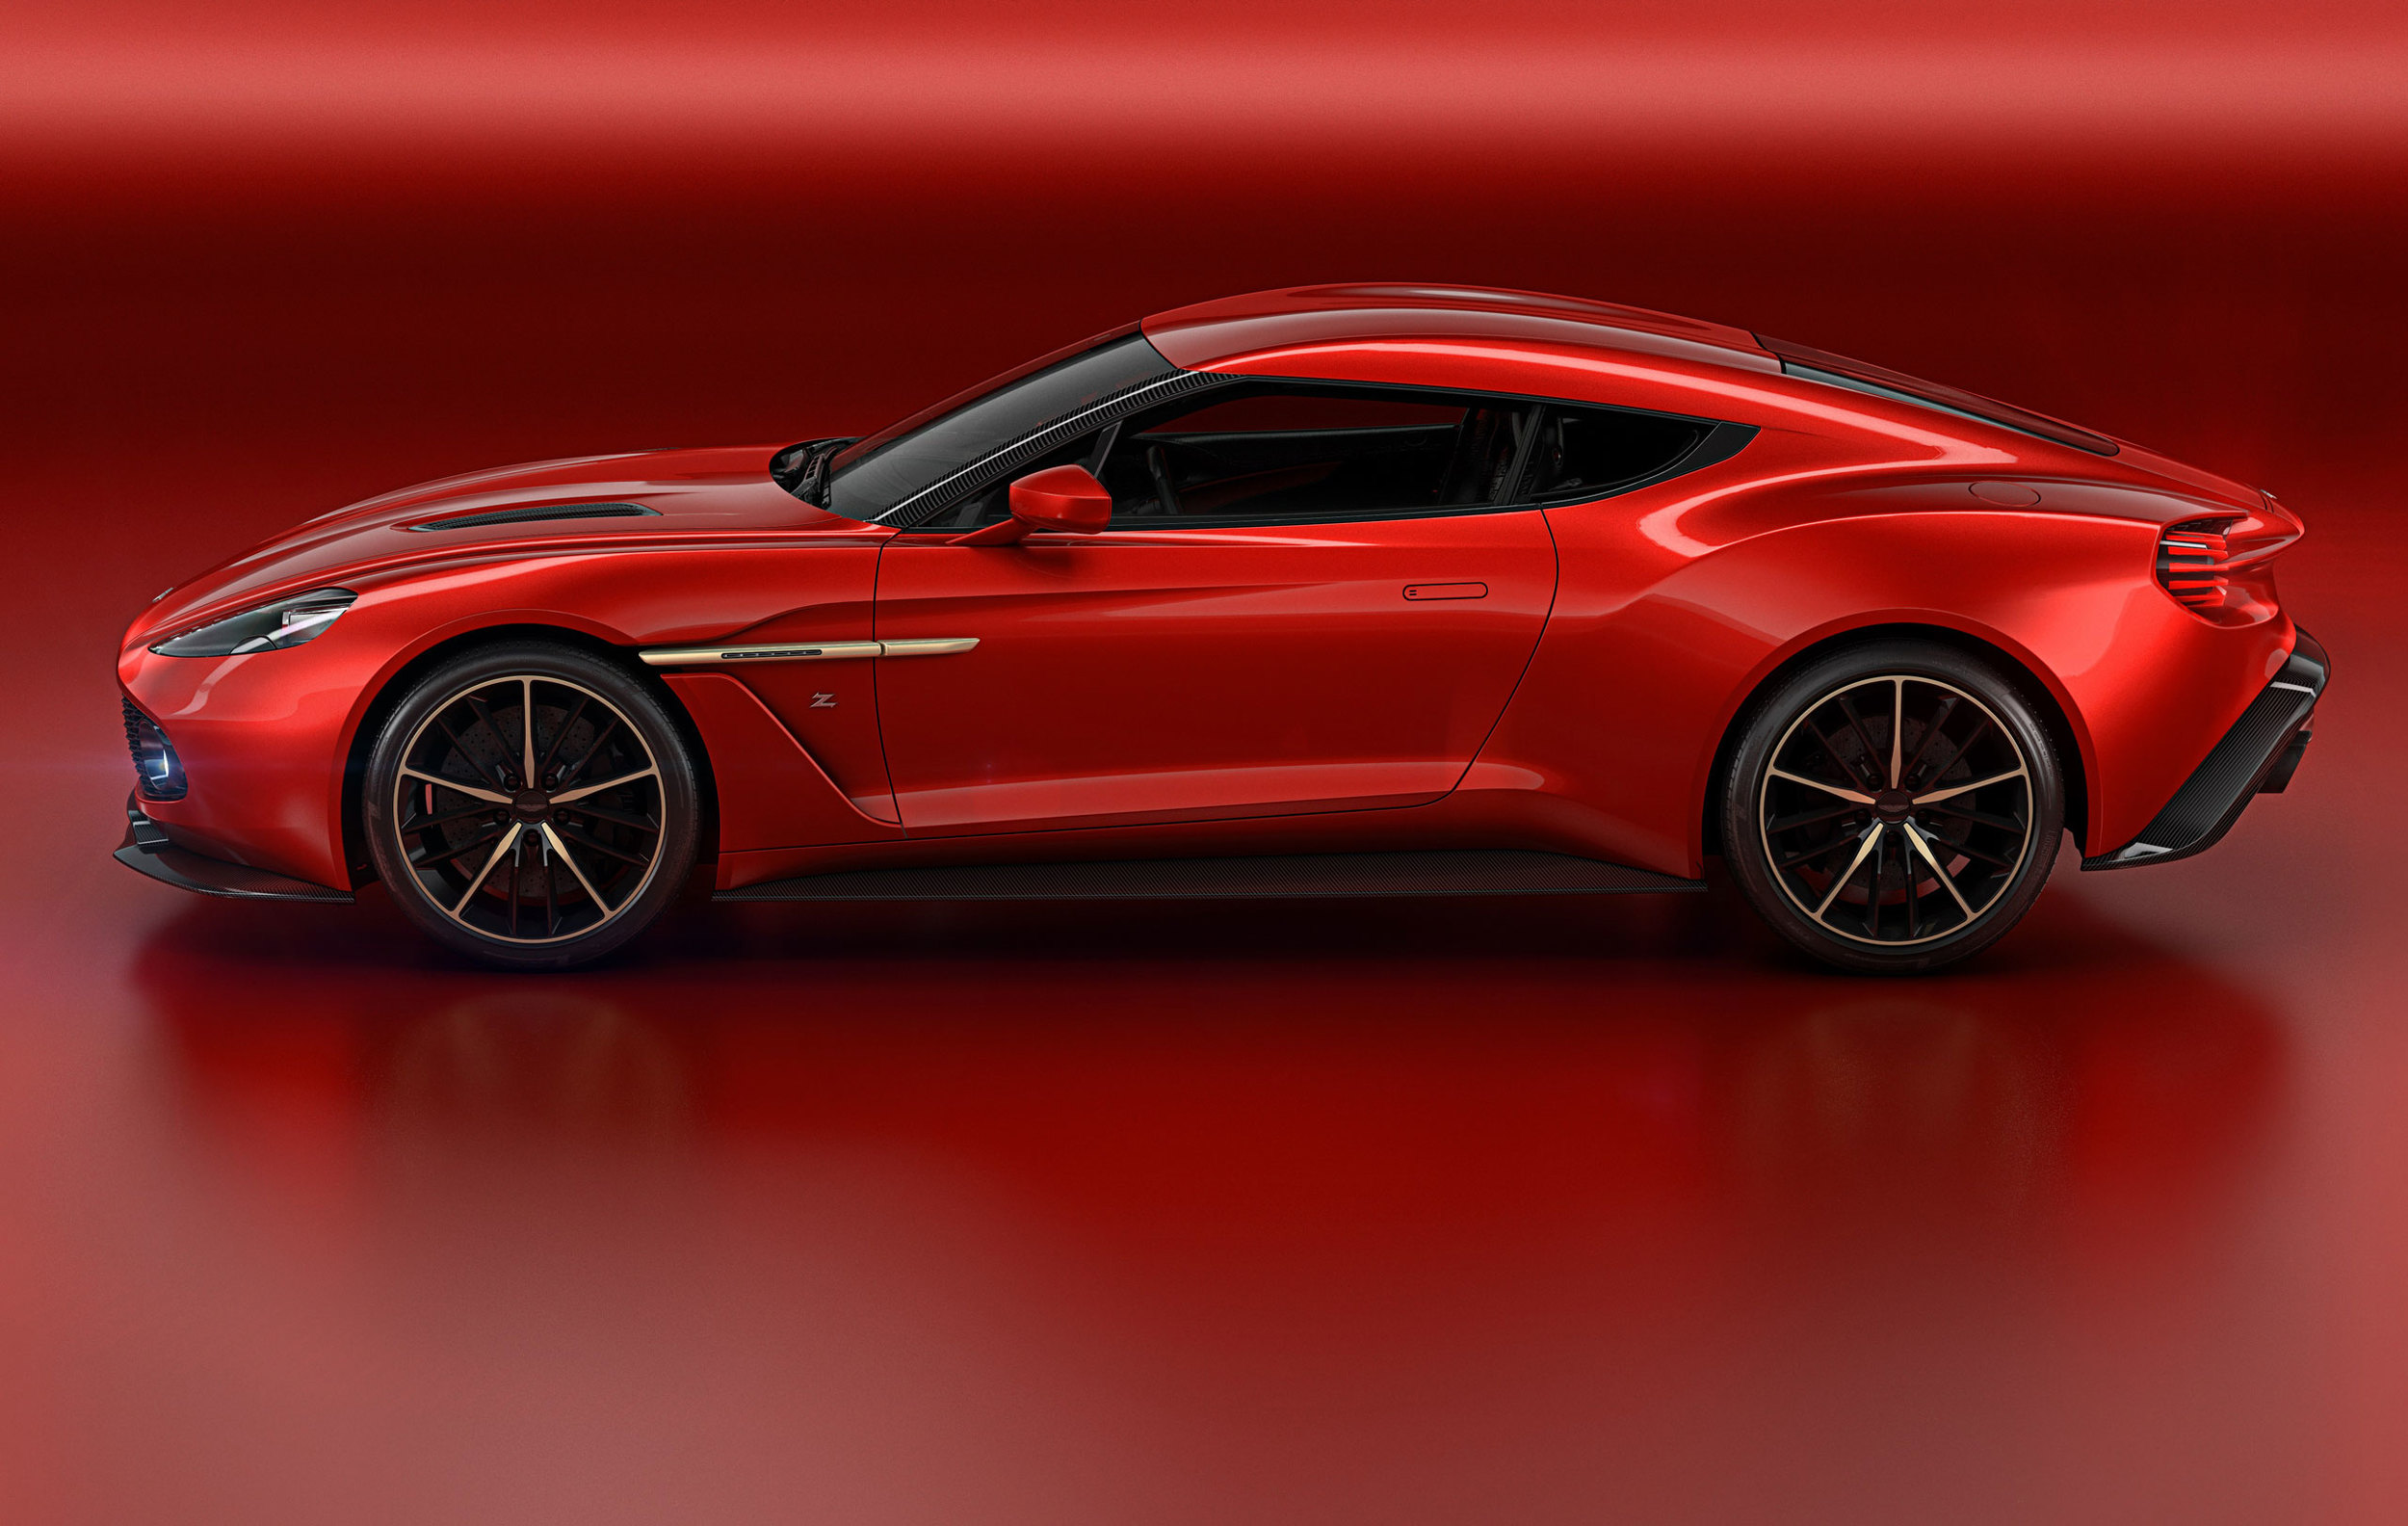 Aston-Martin-Vanquish-Zagato-Concept_09.jpg